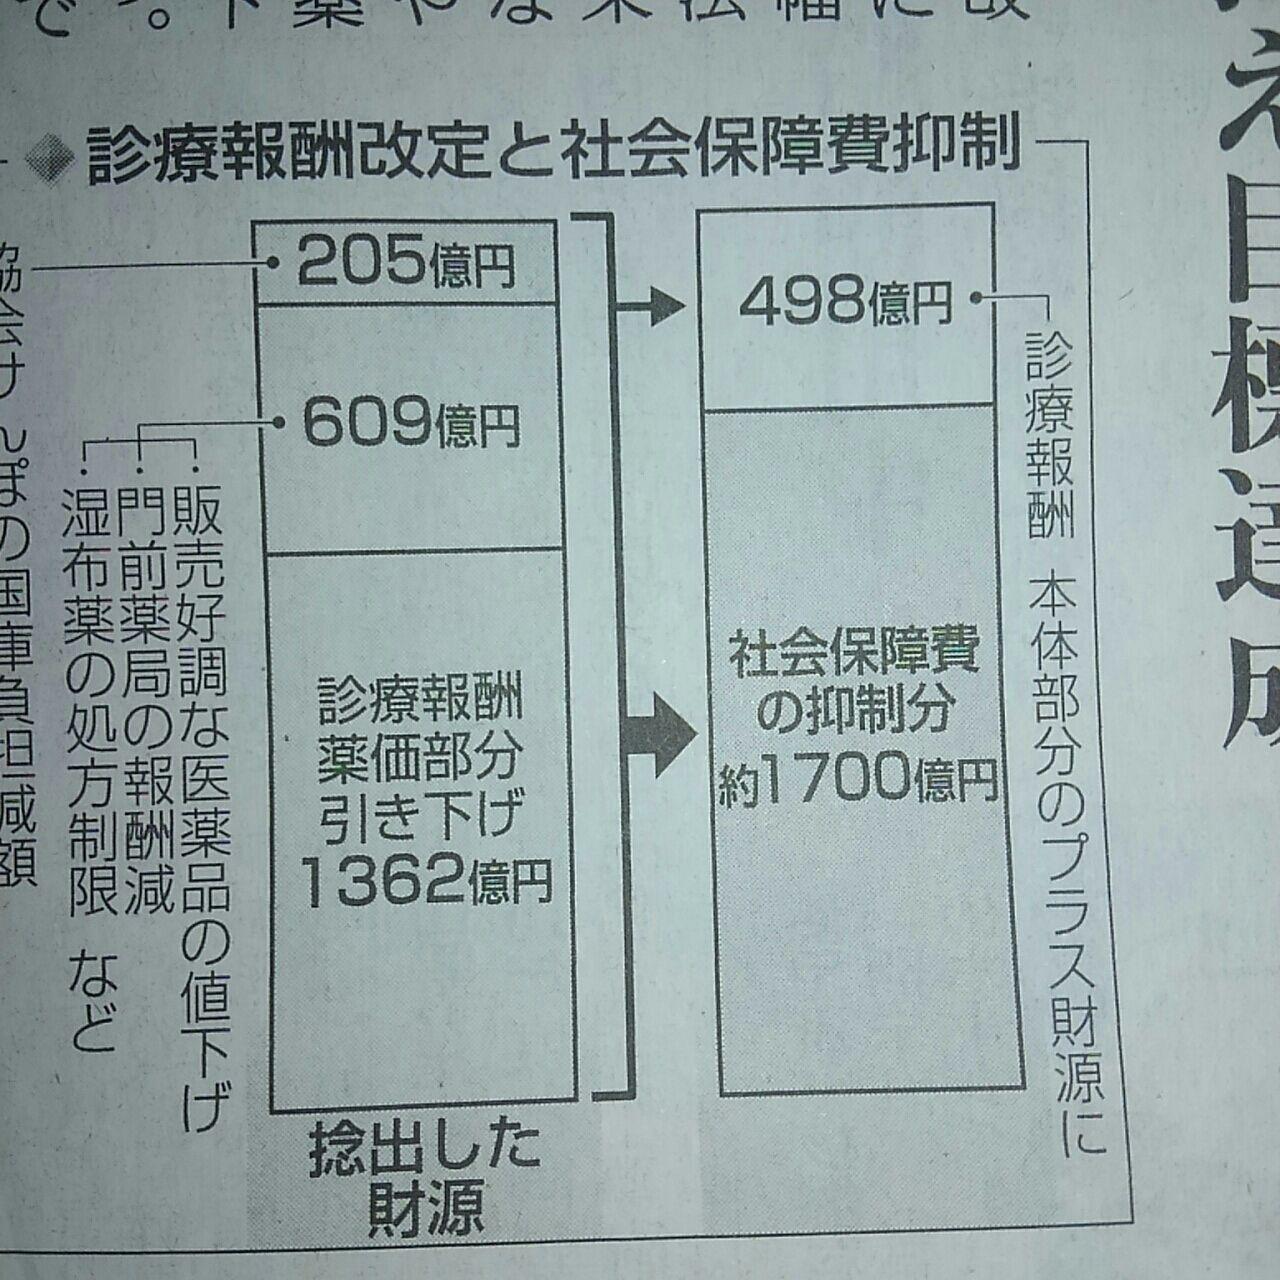 http://livedoor.blogimg.jp/zono421128/imgs/c/f/cf914b98.jpg